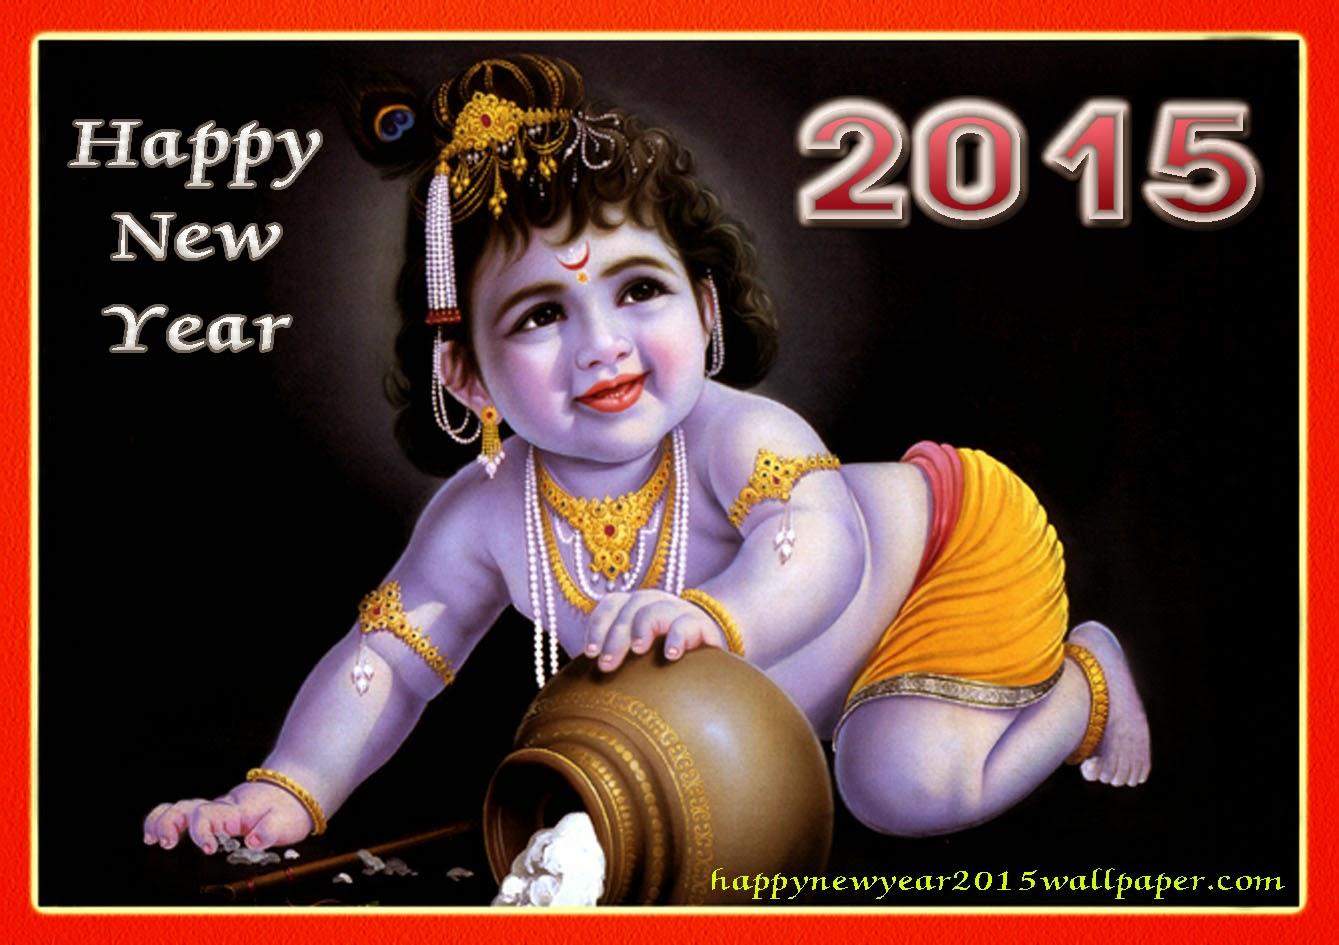 Happy New Year Lord Krishna Happy New Year 2015 God